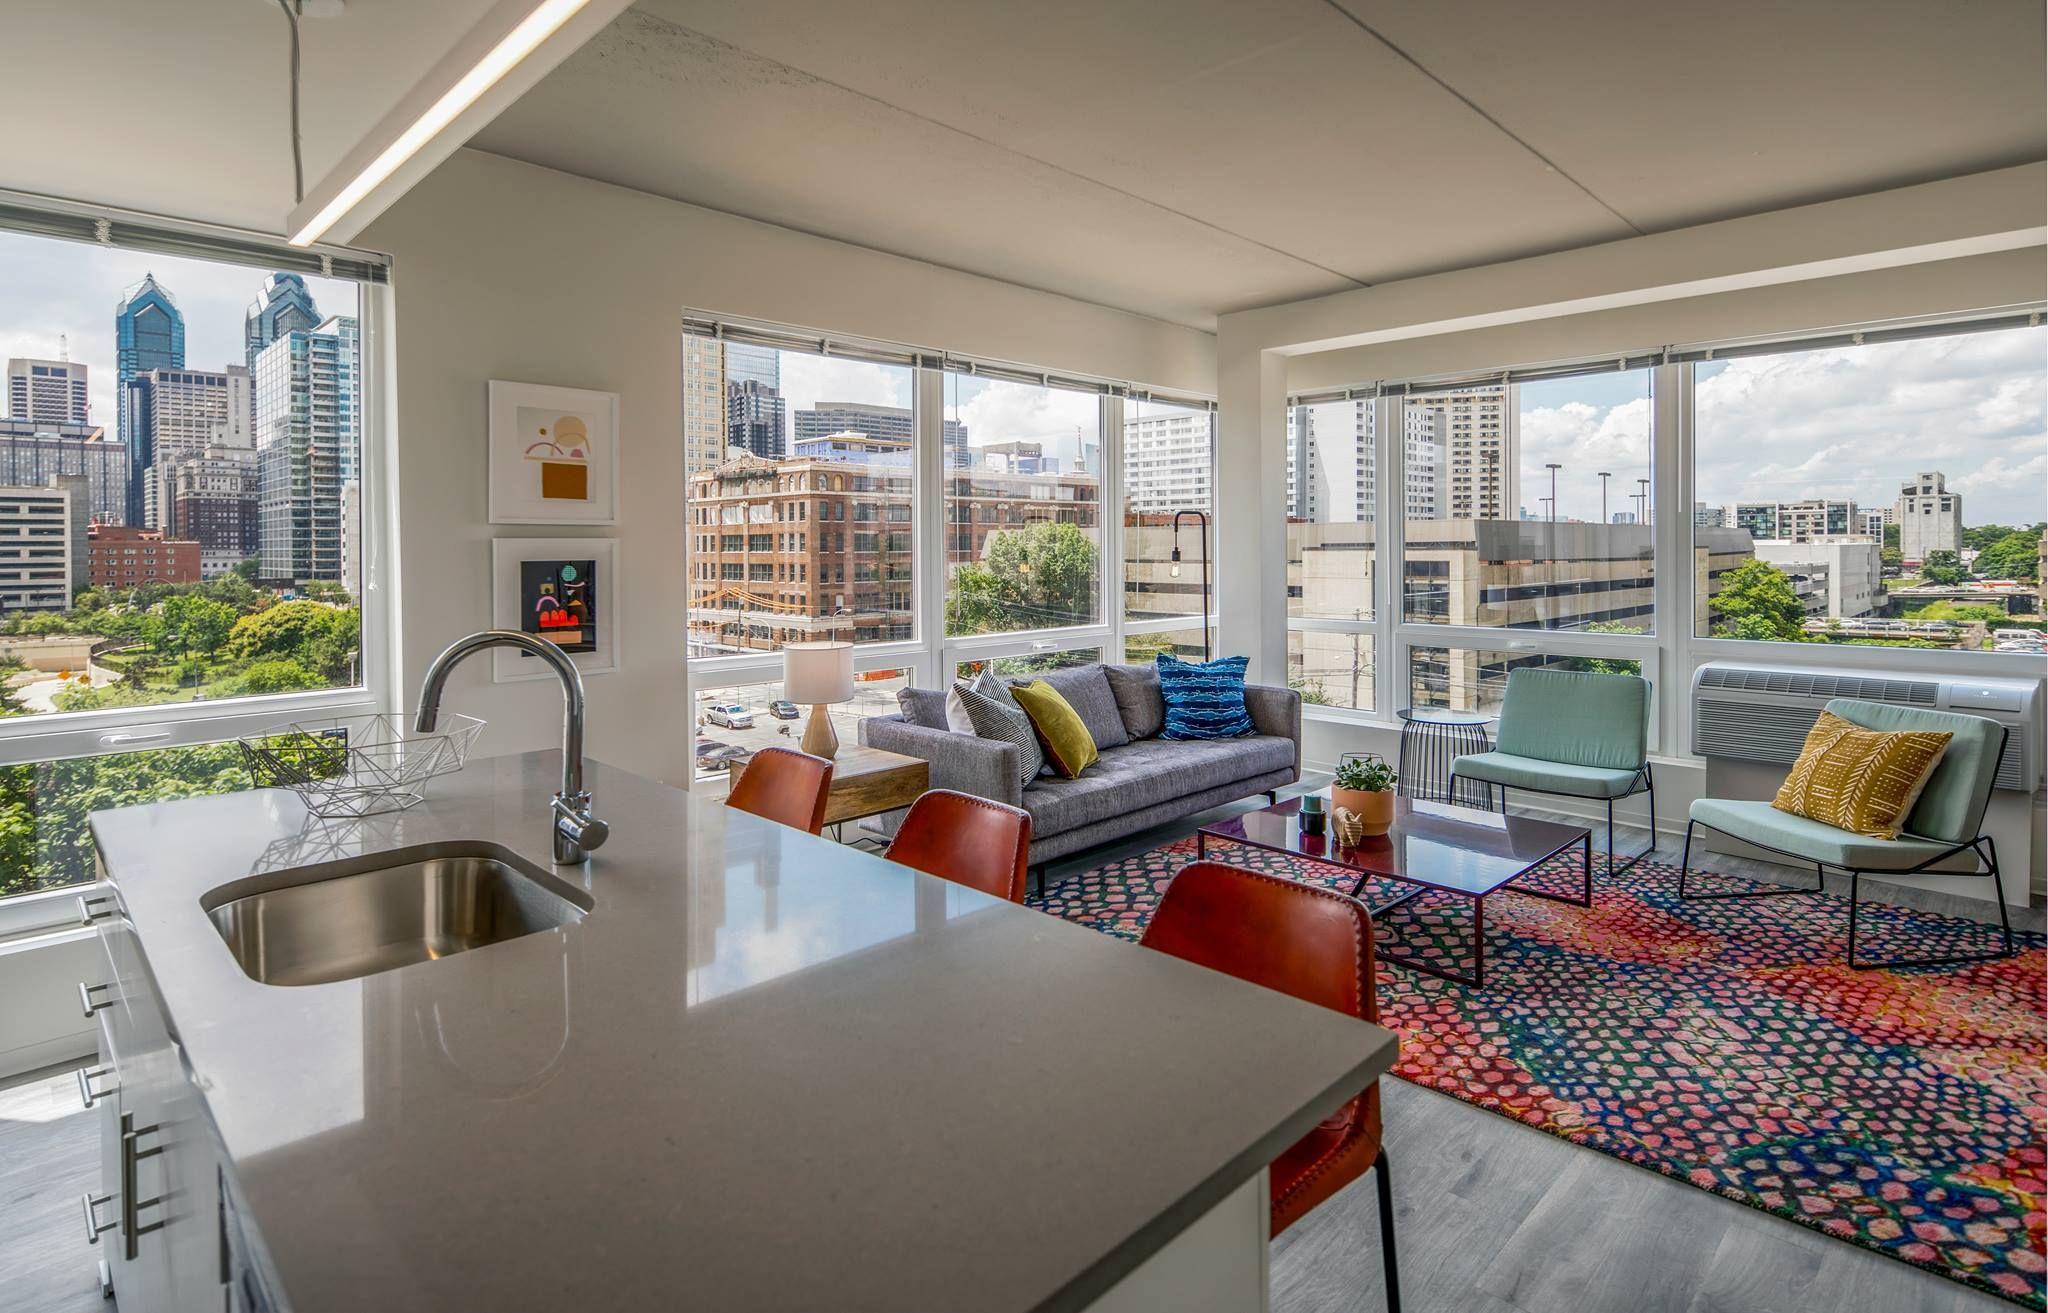 The Hamilton Apartments Philadelphia Pa Ava Smpl Spartansurfaces Floorscore Lvt Interiord Multifamily Housing Residential Design Luxury Apartments